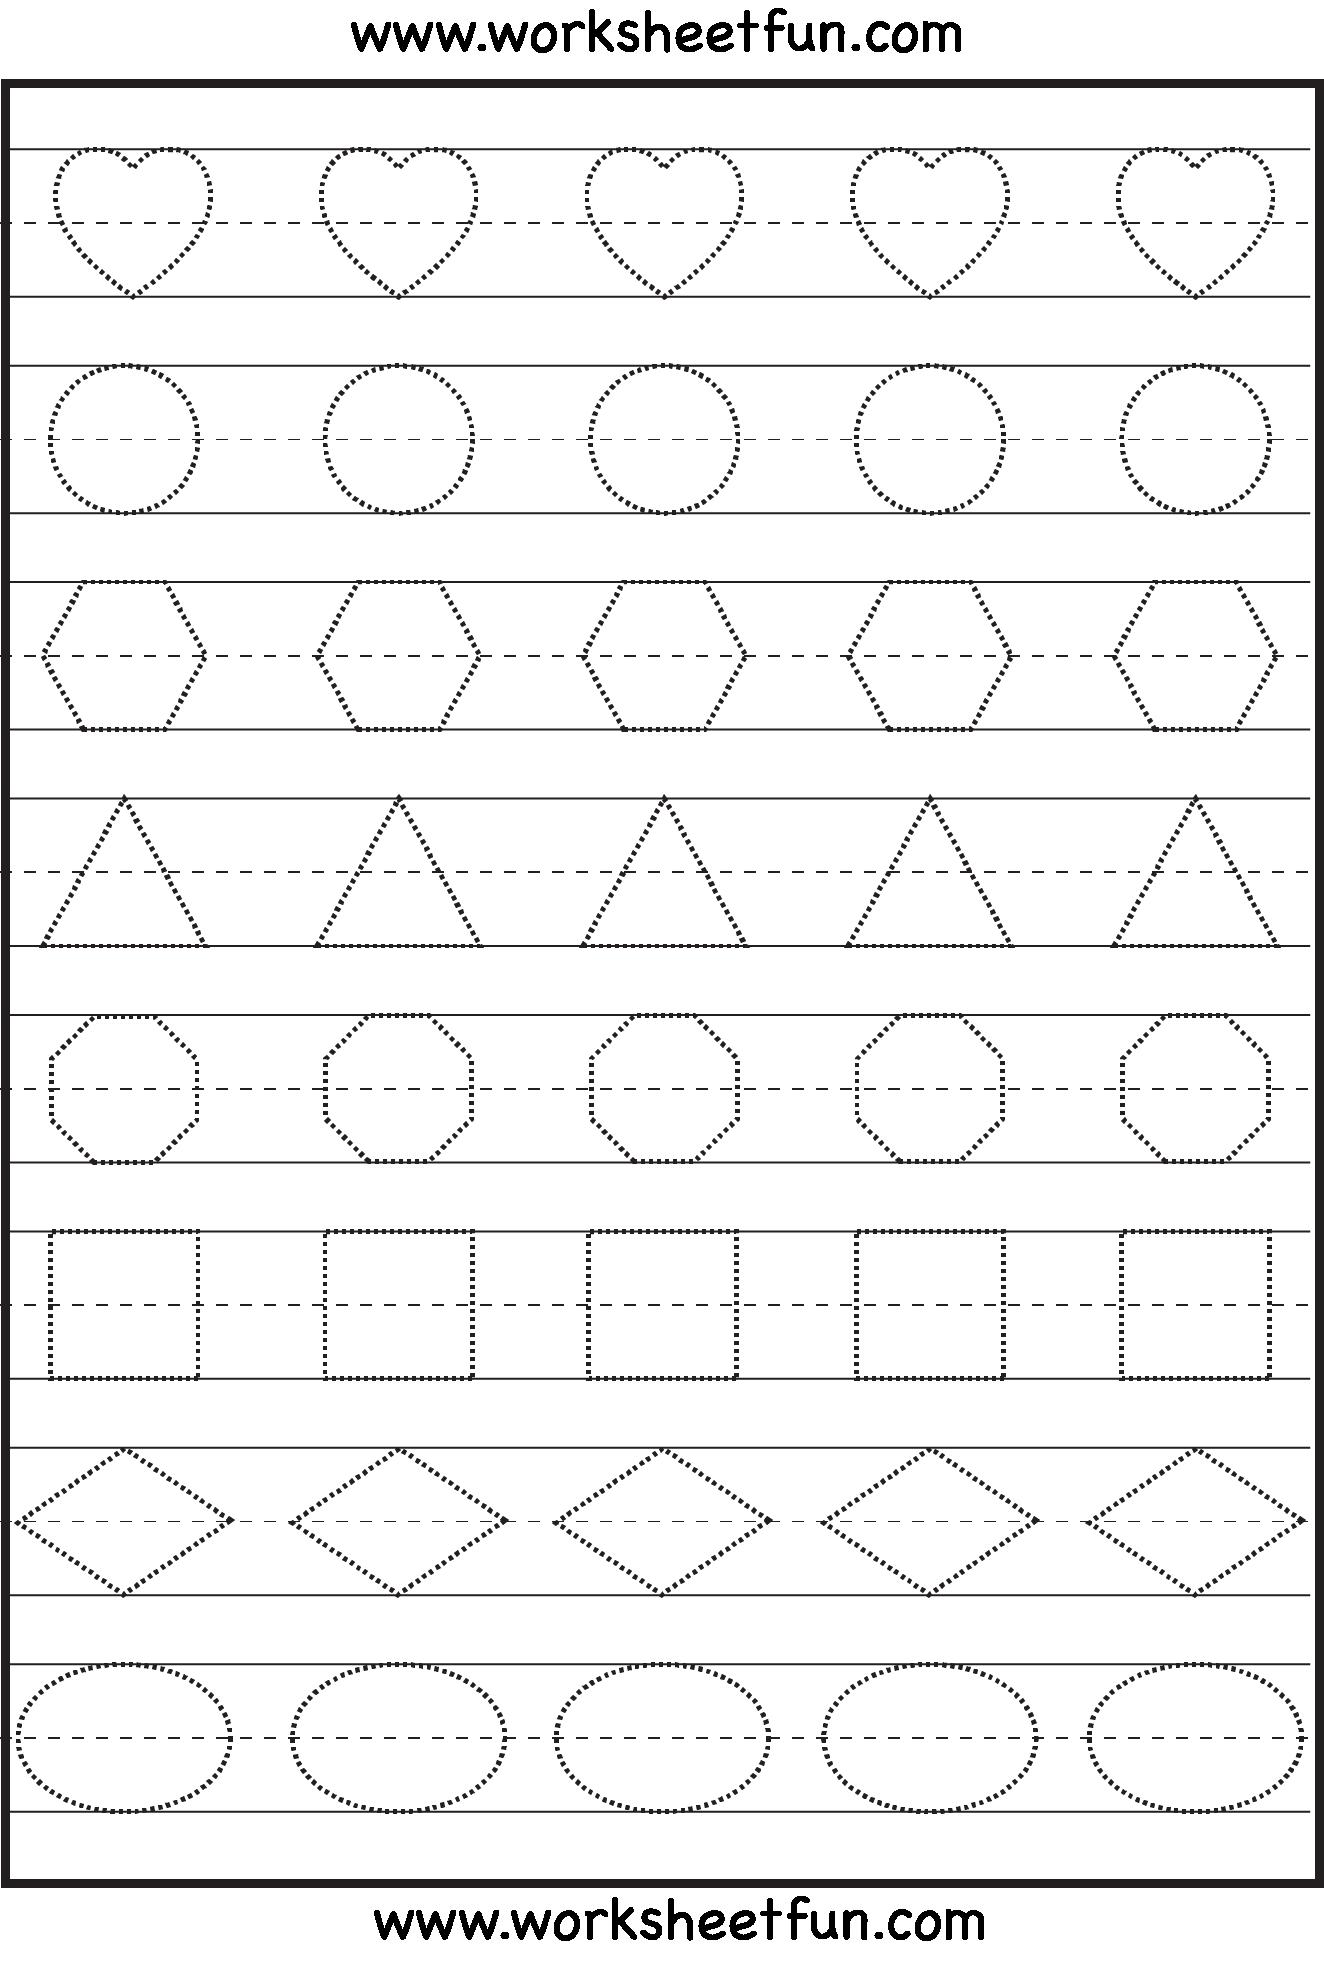 5 Images of Free Preschool Printables